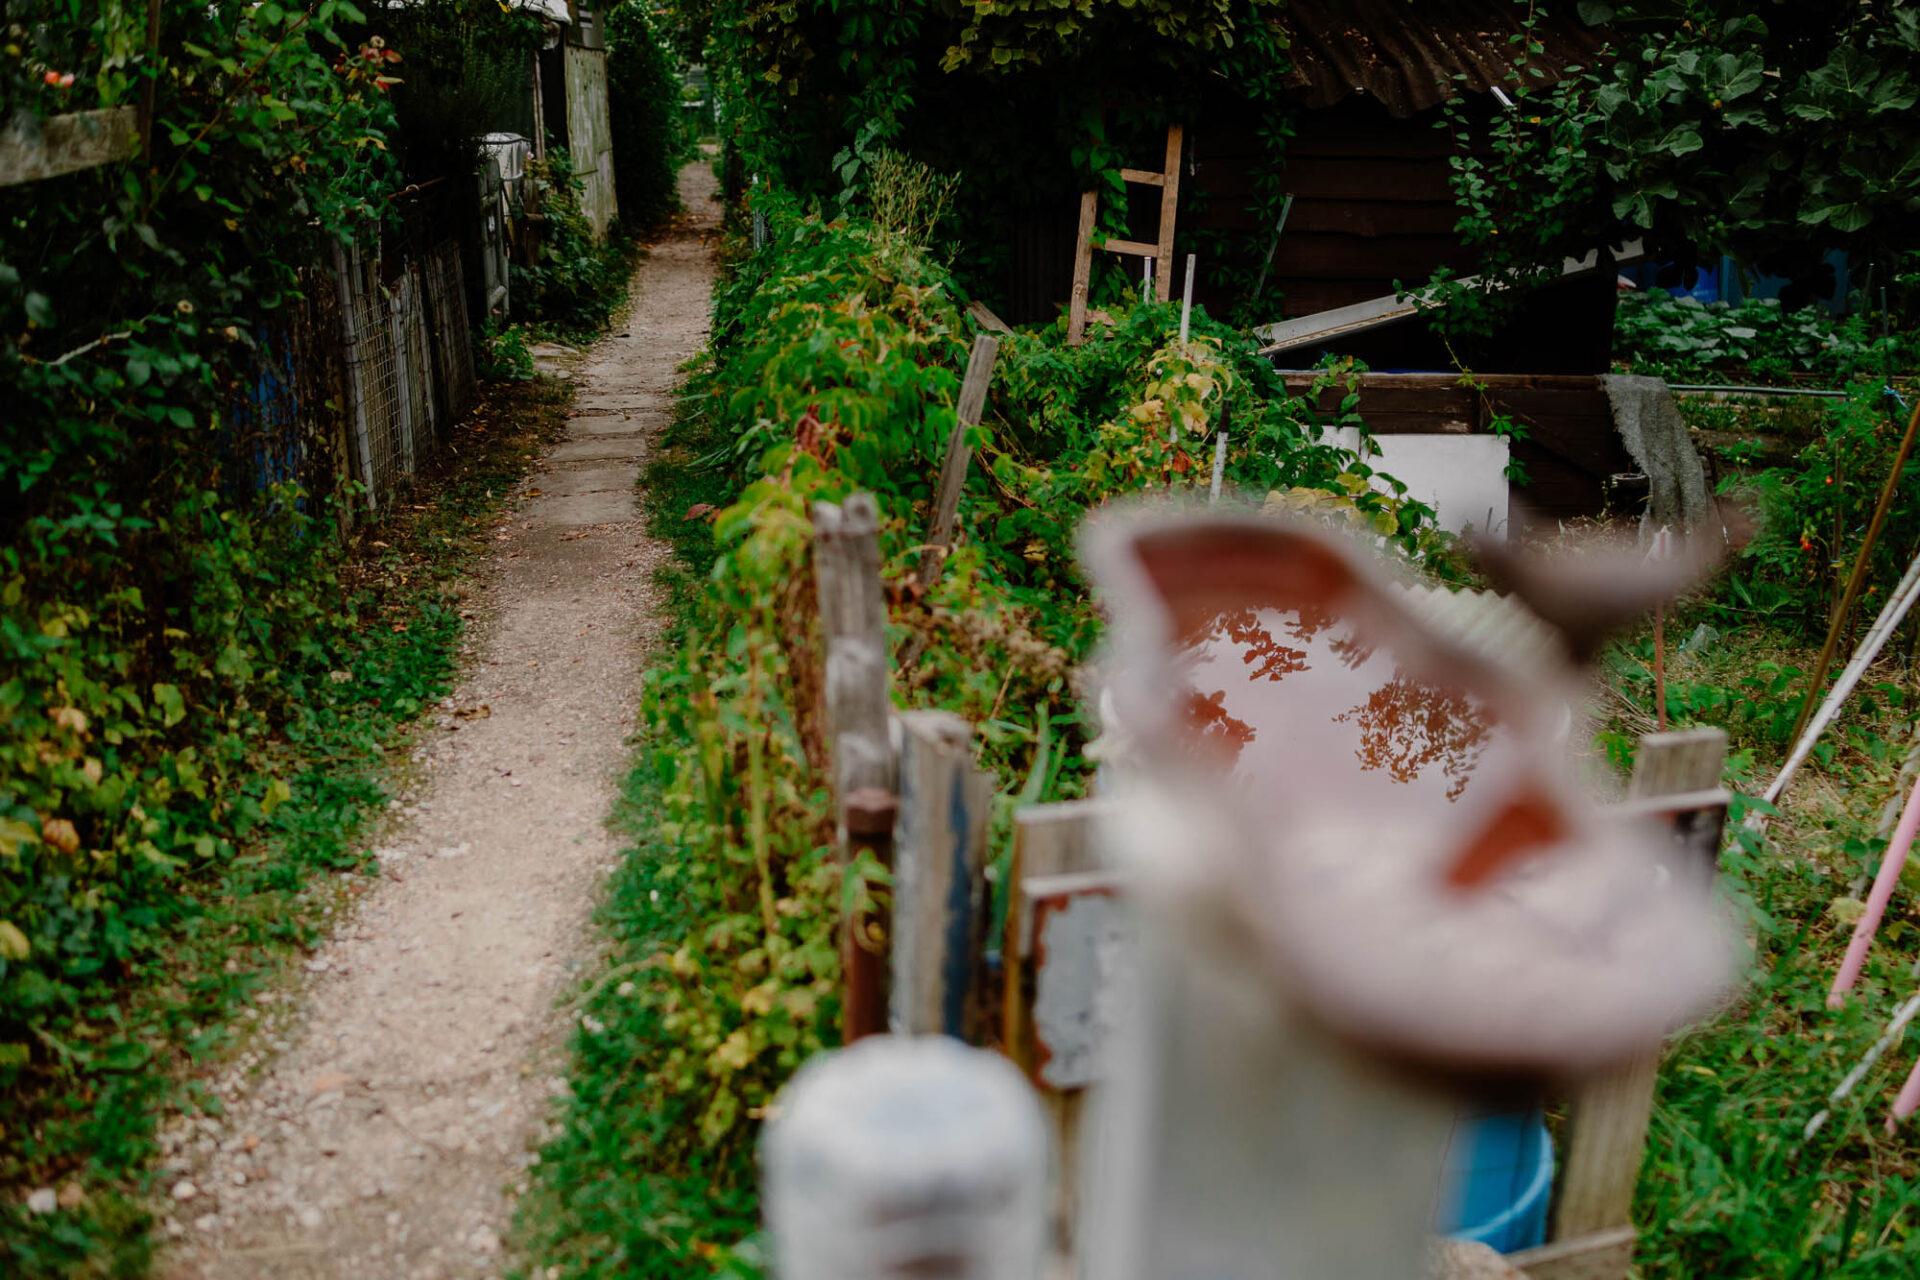 Jardins ouvriers aubervilliers 37 - Dagmara Bojenko - Eco-conscious Weddings, Births & Families